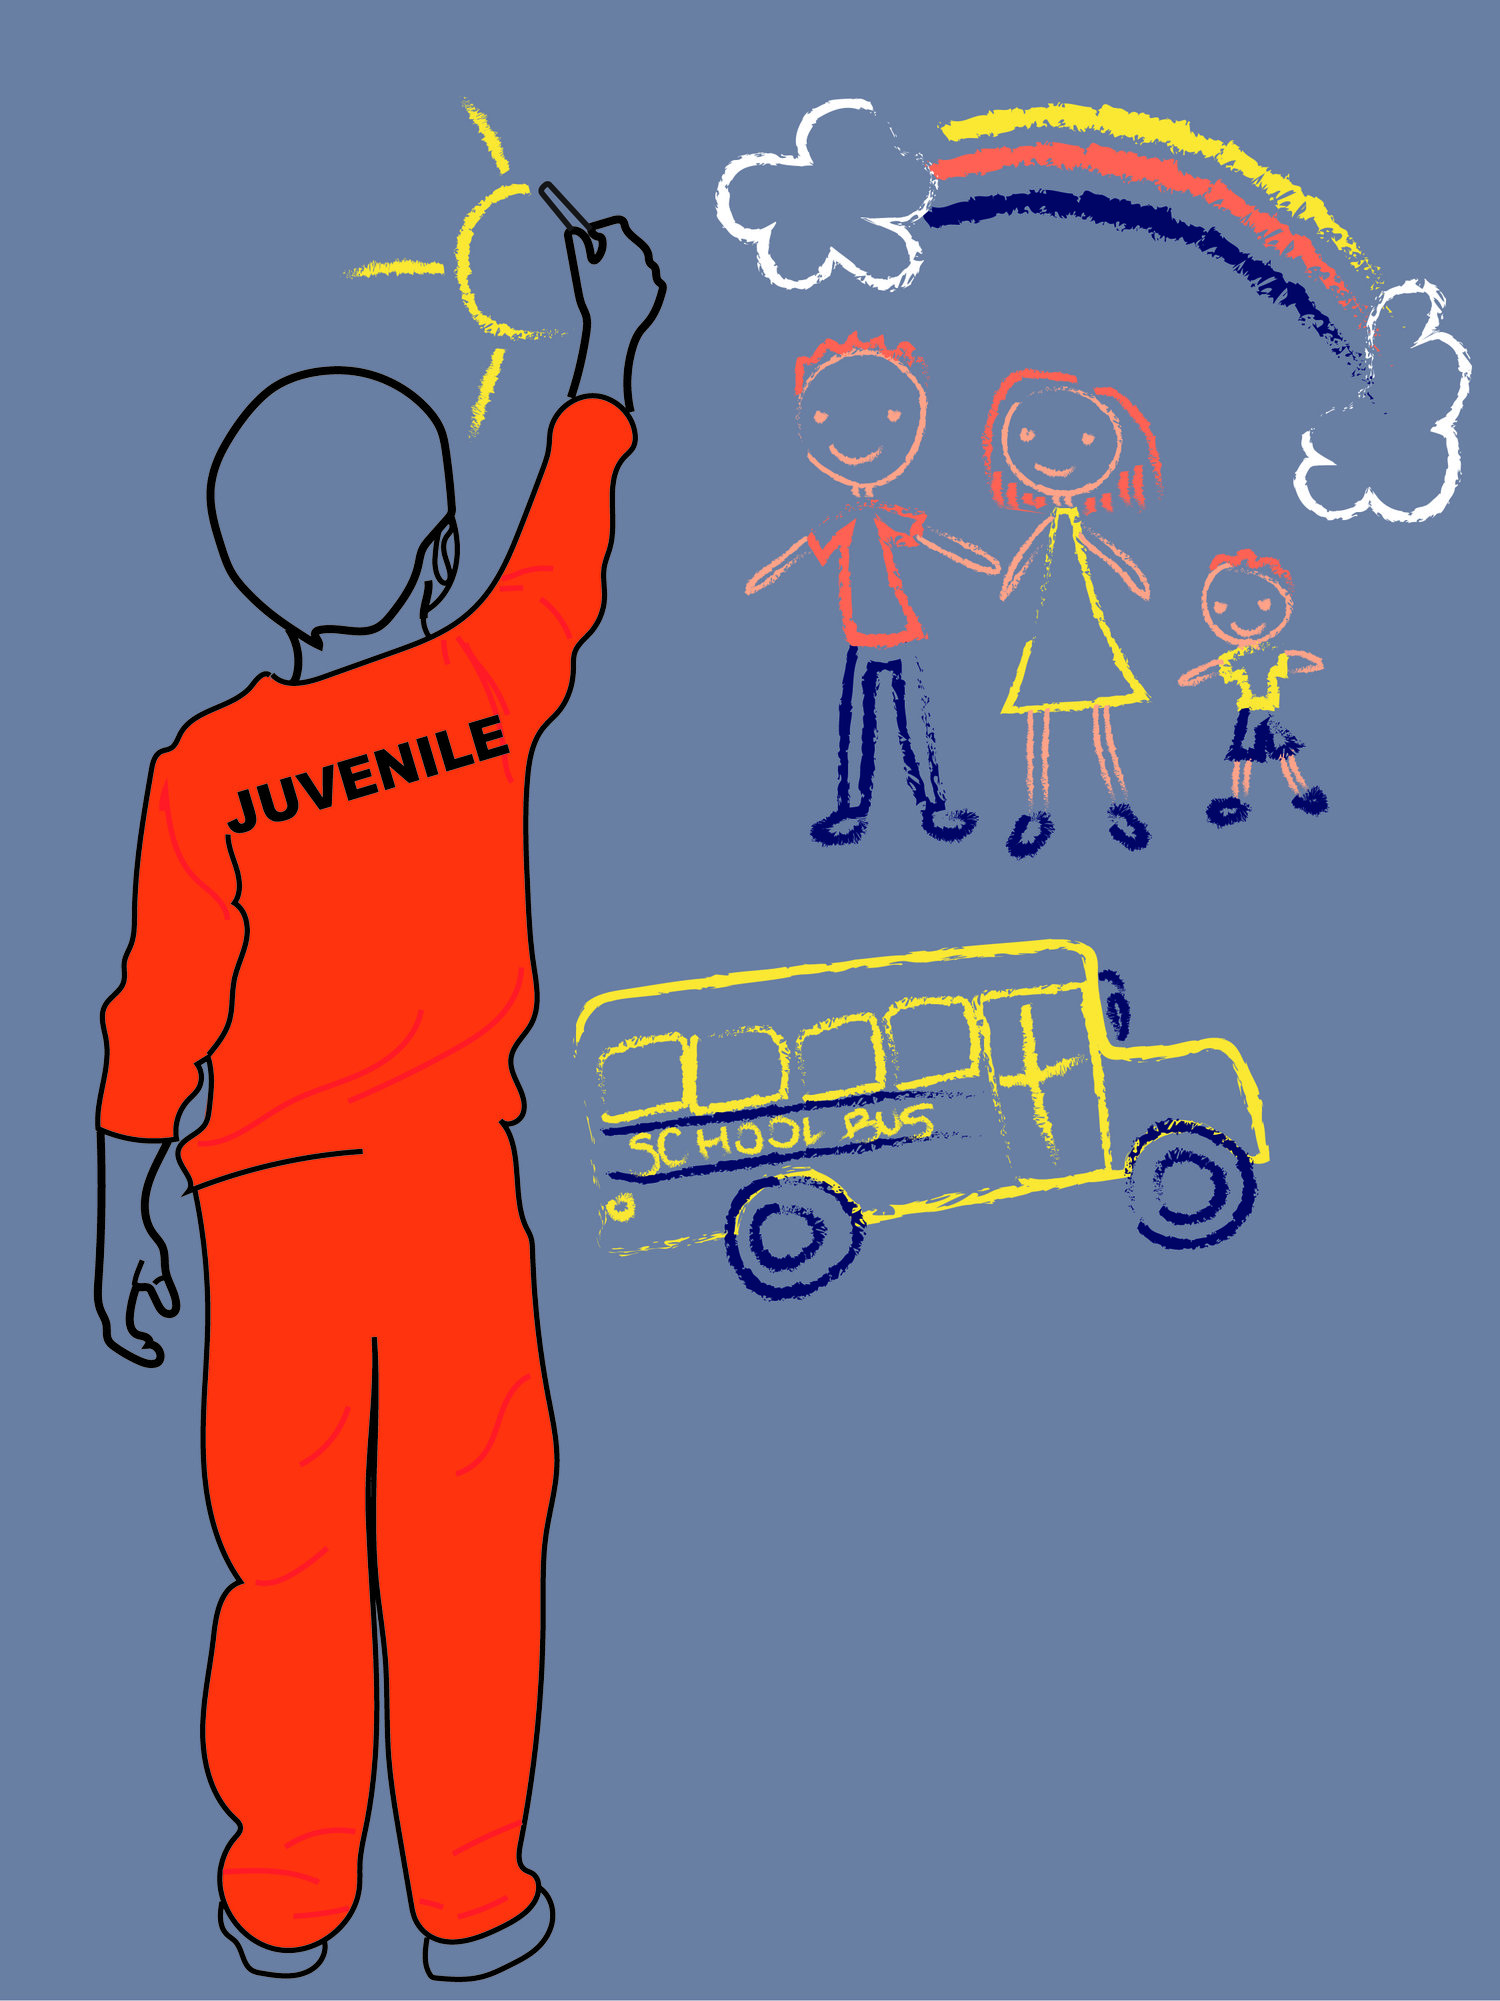 The path towards reform. Jail clipart juvenile justice